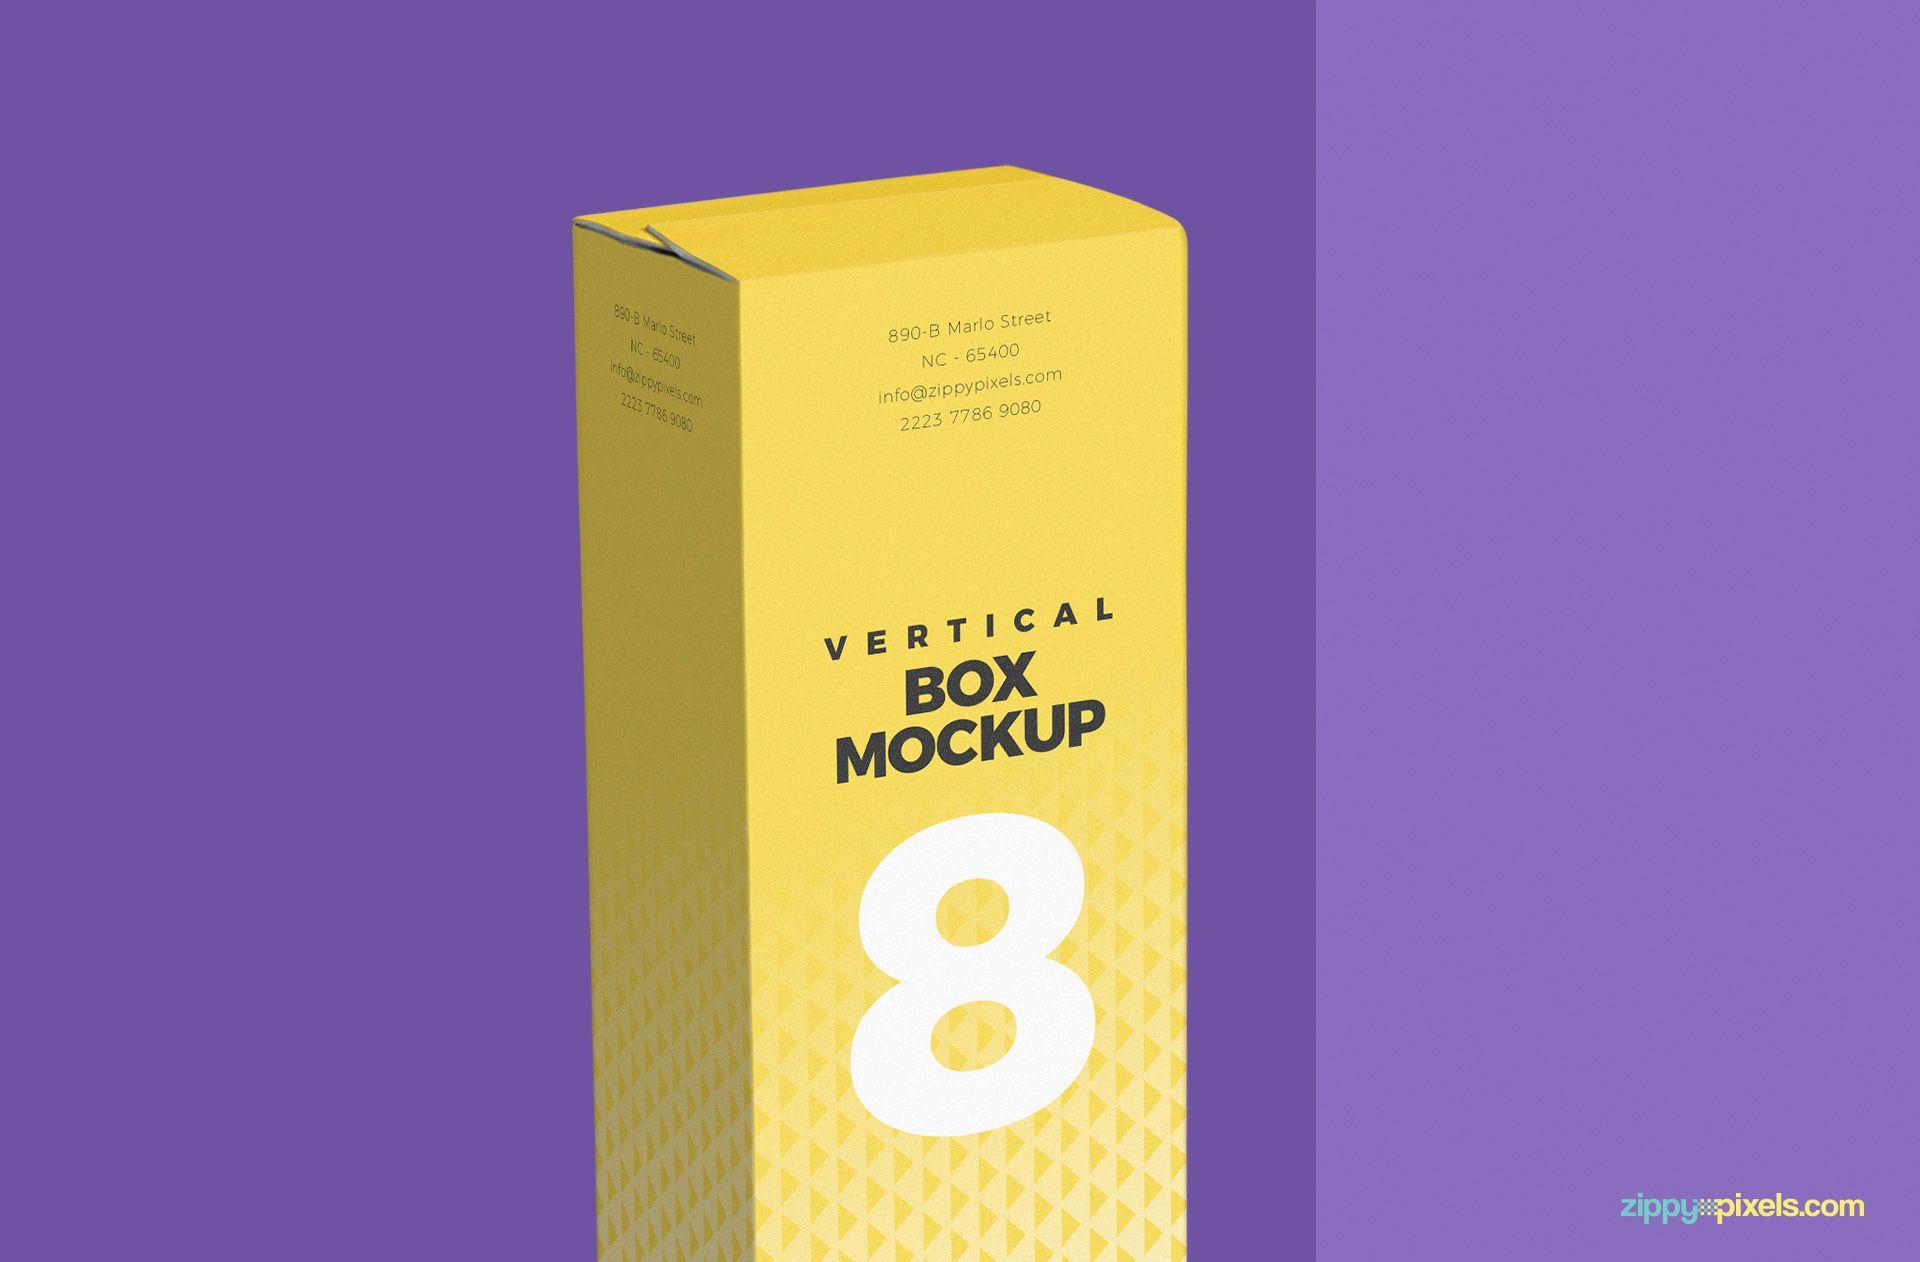 Download Free Vertical Box Mockup For Cardboard Zippypixels Box Mockup Corrugated Box Design Packaging Mockup